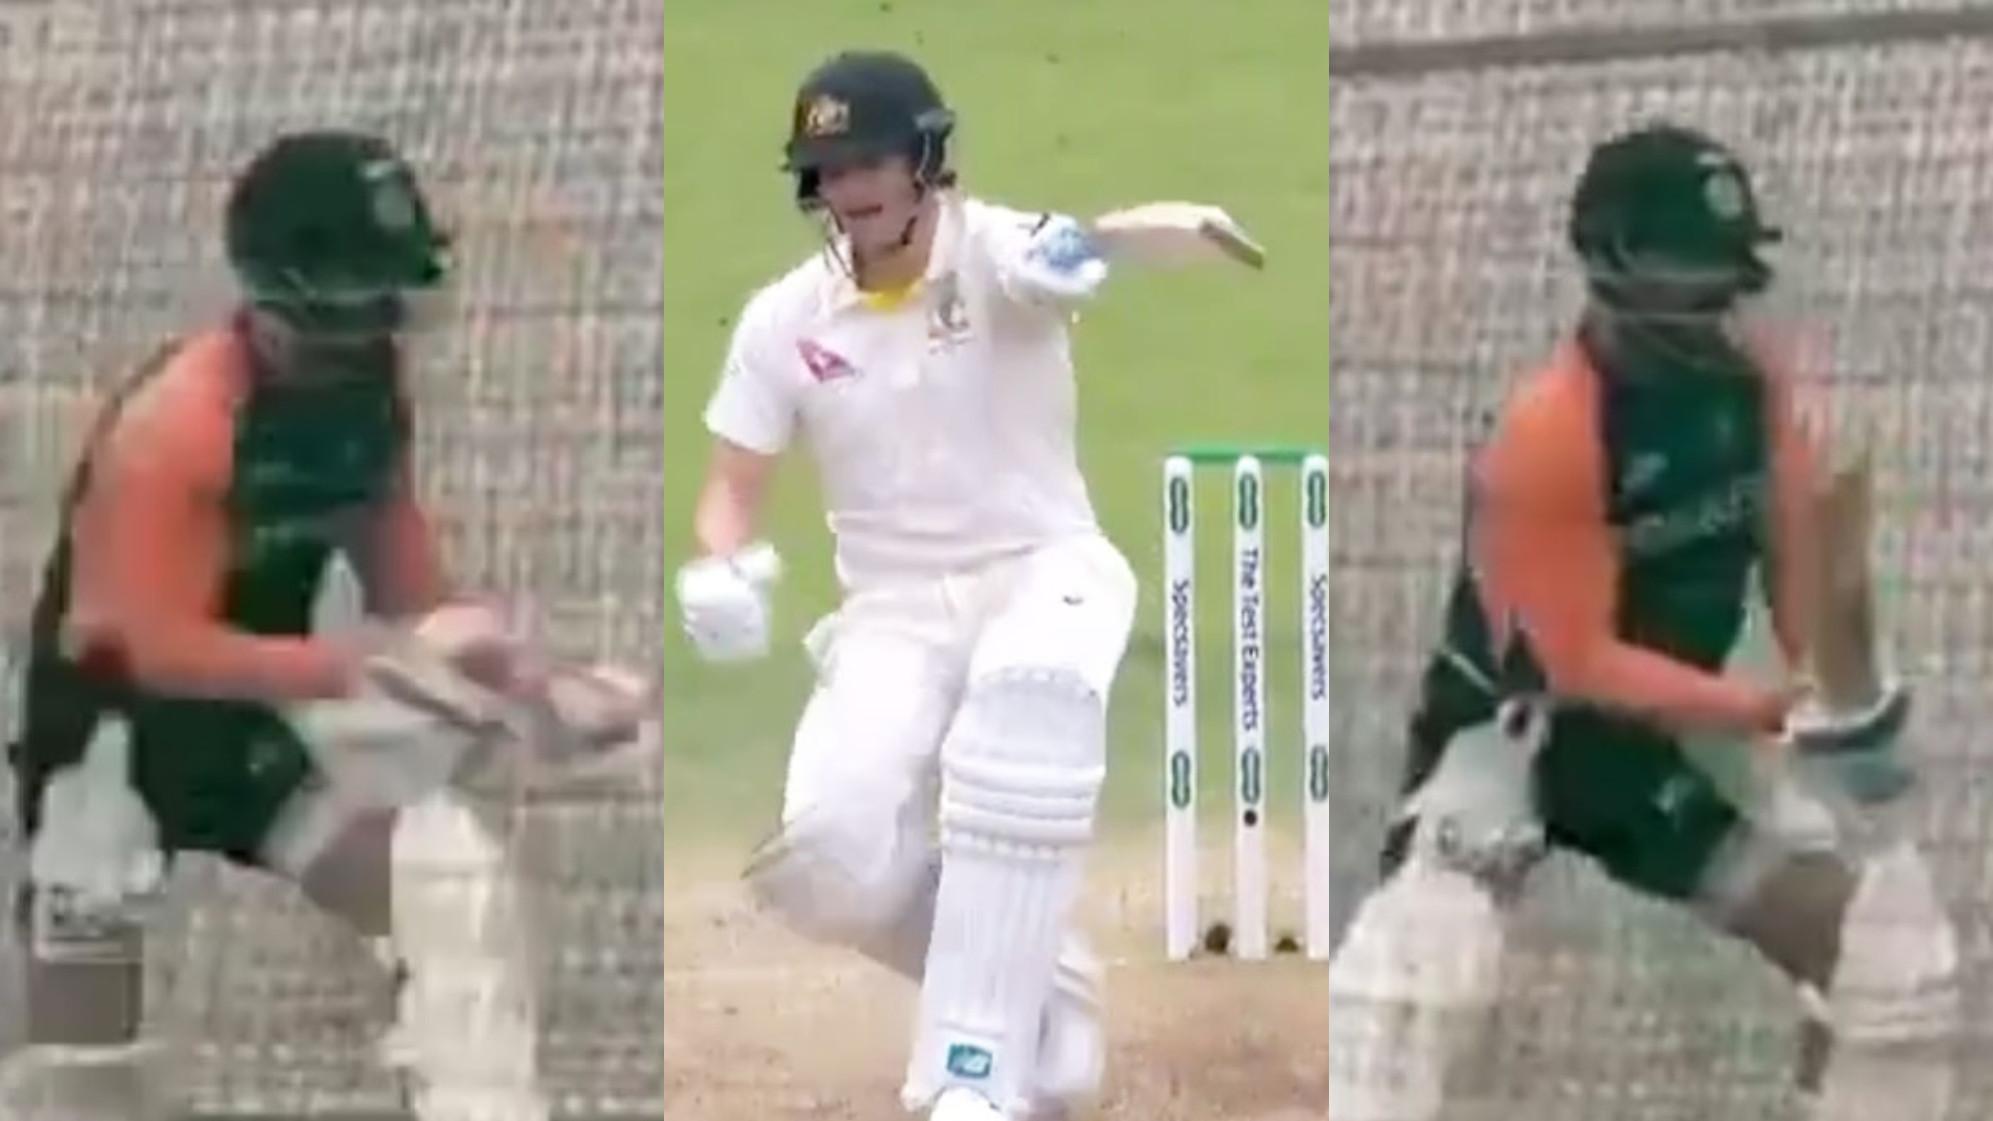 IND v ENG 2021: WATCH- Virat Kohli imitates Steve Smith's mannerisms during nets